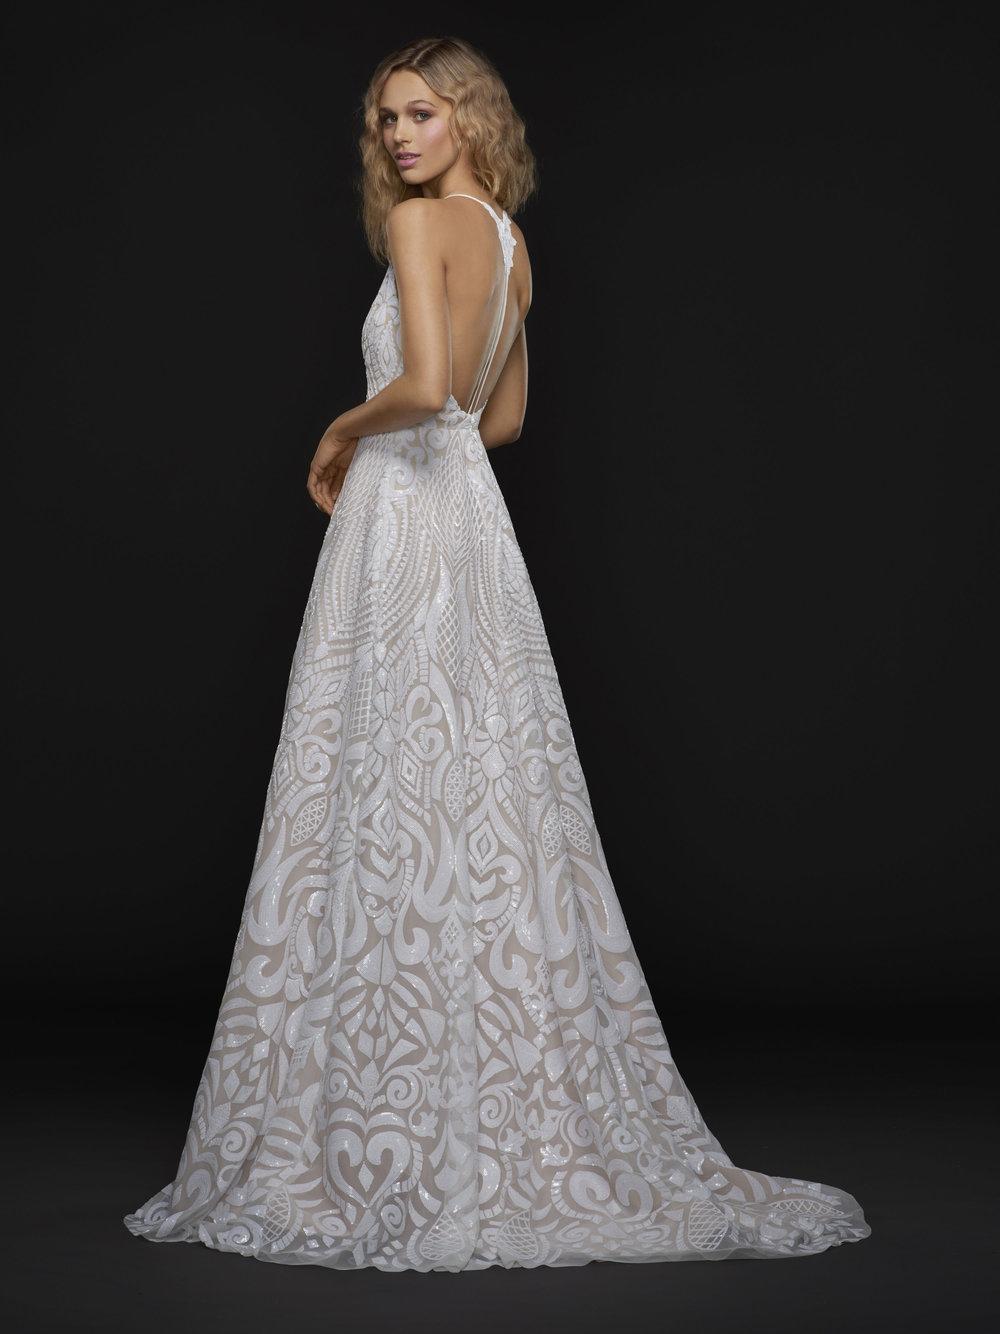 blush-hayley-paige-bridal-fall-2017-style-1751-delta_ivory-and-beau-savannah-bridal-boutique-savannah-wedding-dresses-savannah-bridal-shop-savannah-georgia-bridal.jpg